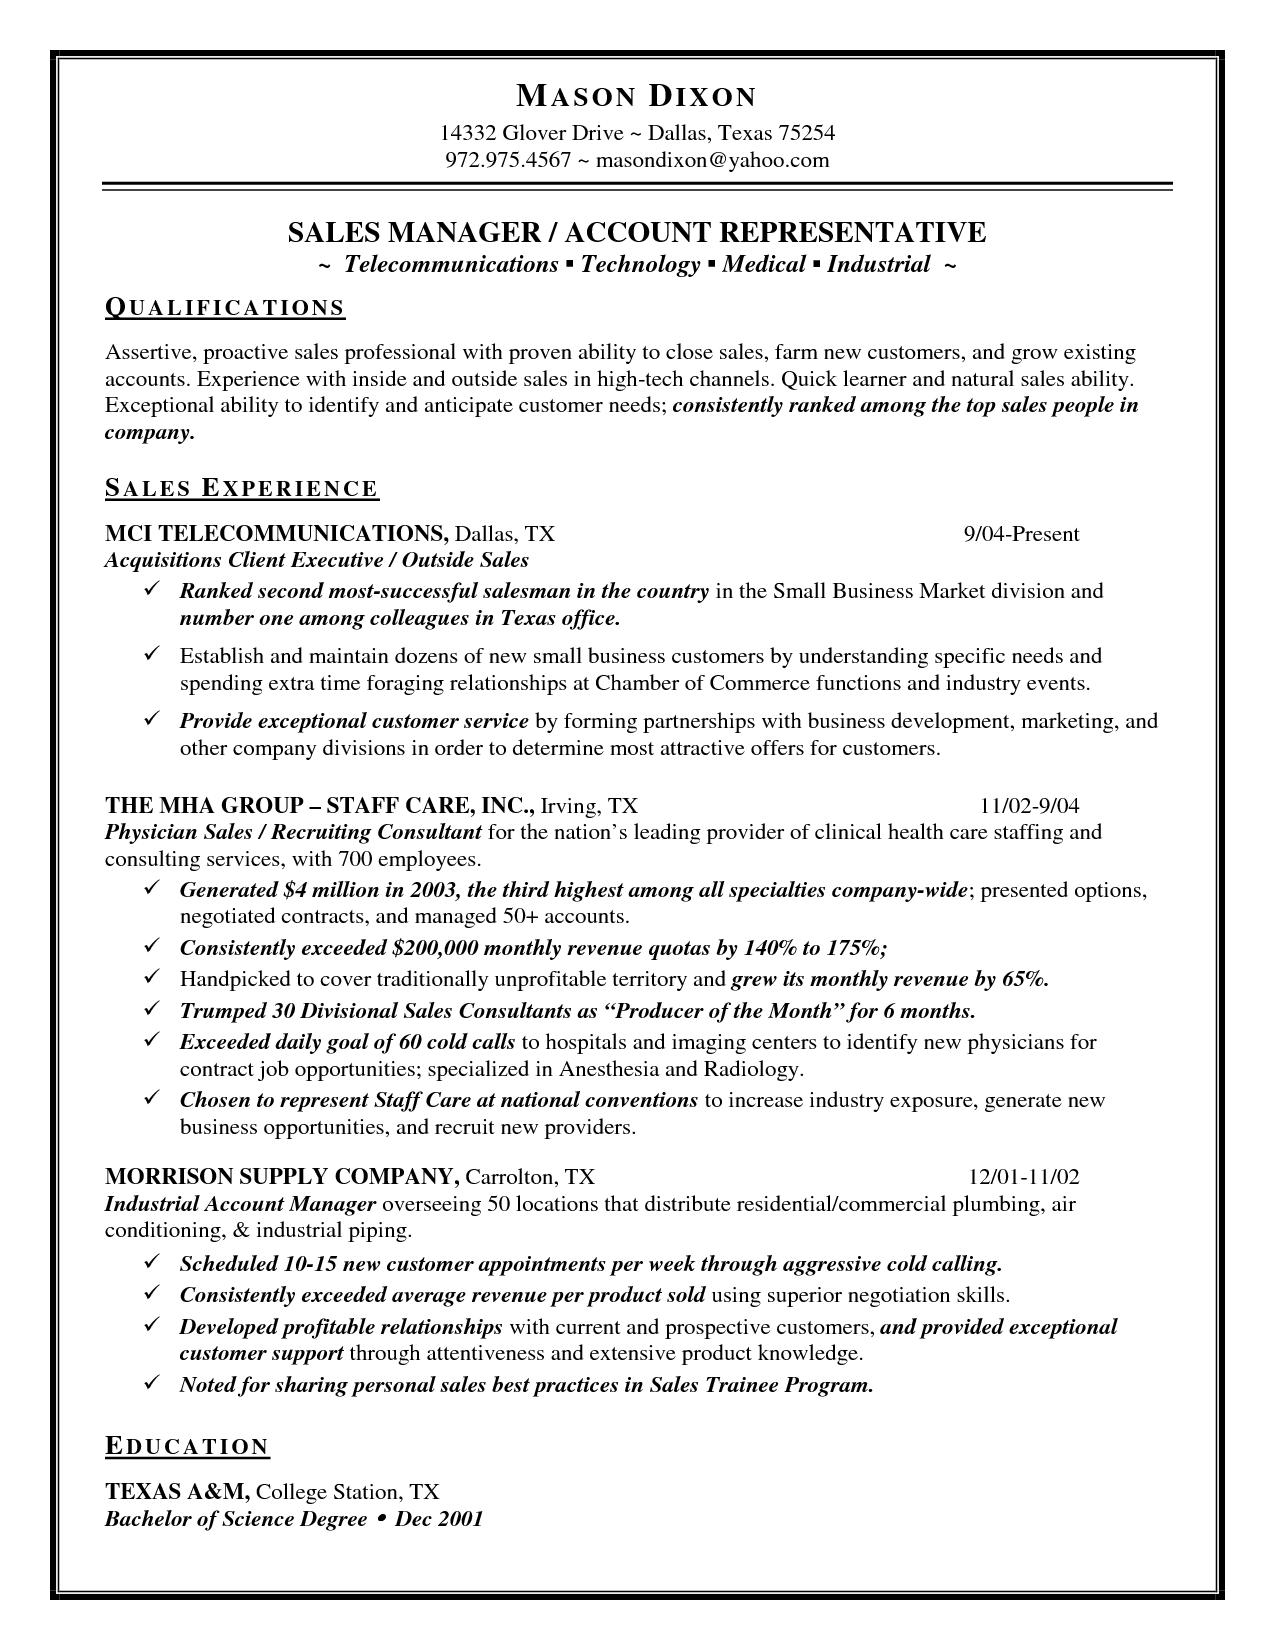 quick learner resume Inside Sales Resume Sample MASON